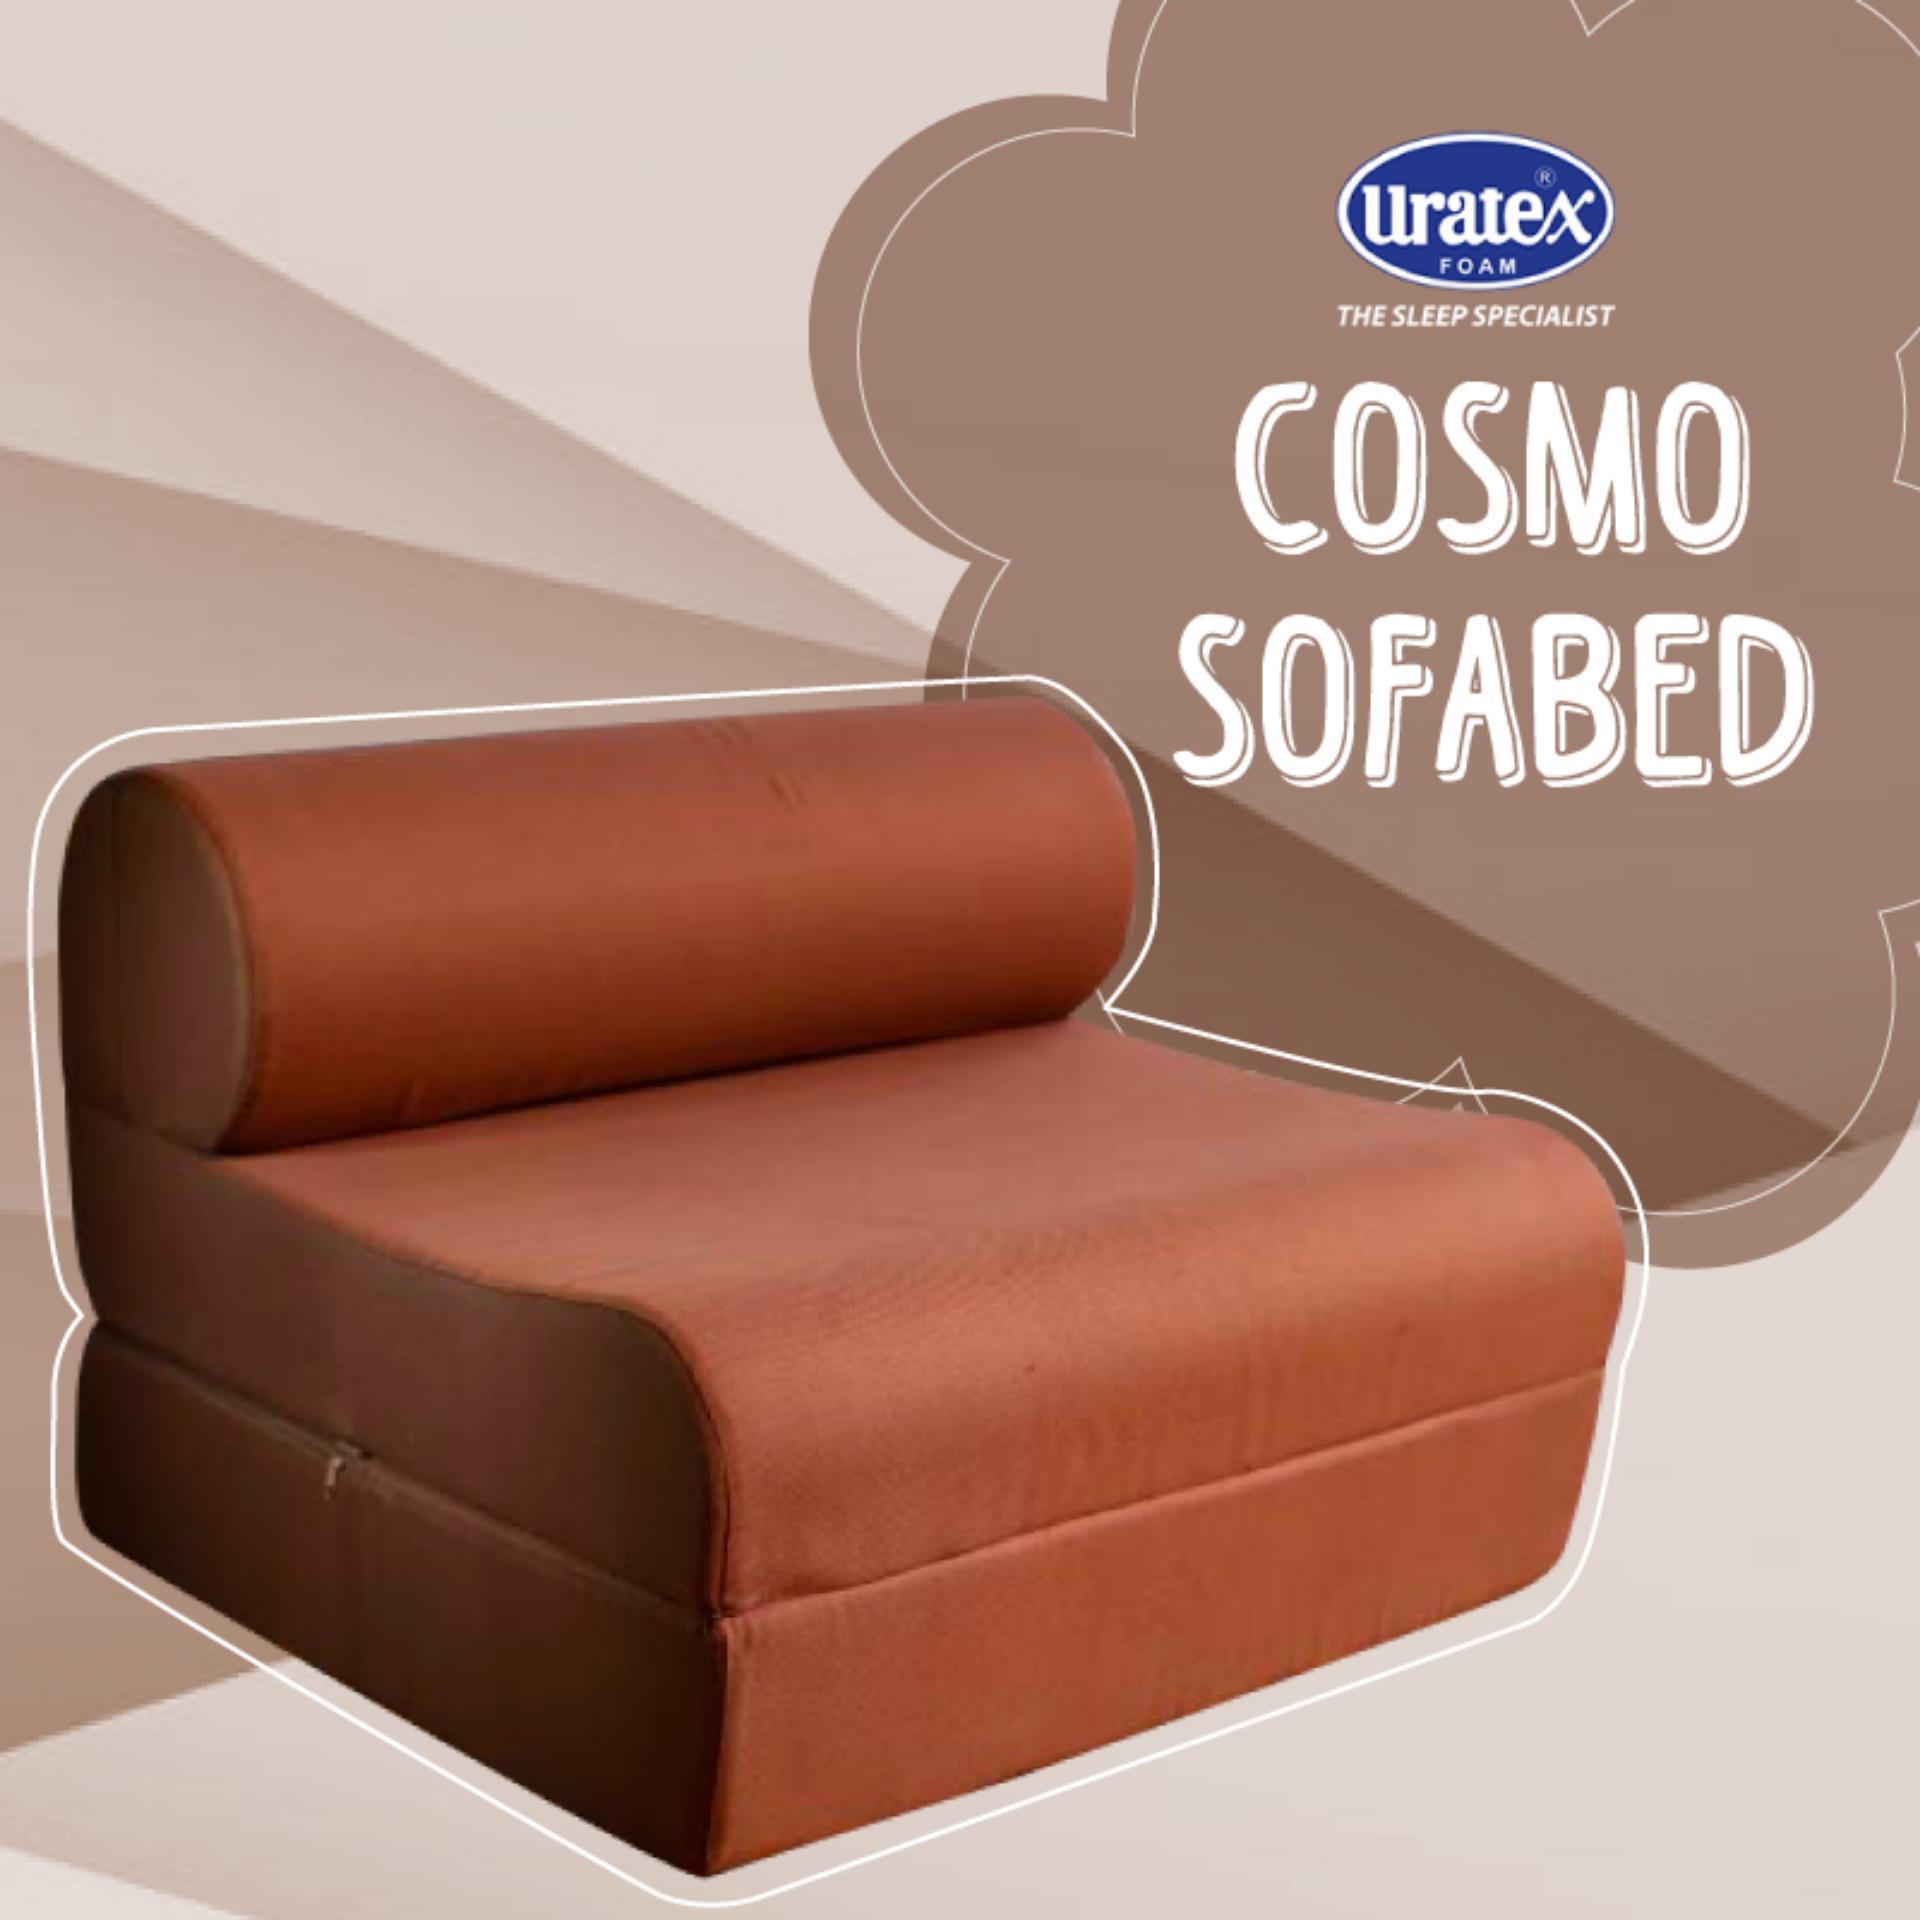 List Of Living Room Furniture Uratex Living Room Furniture For Sale In Philippines Living Room